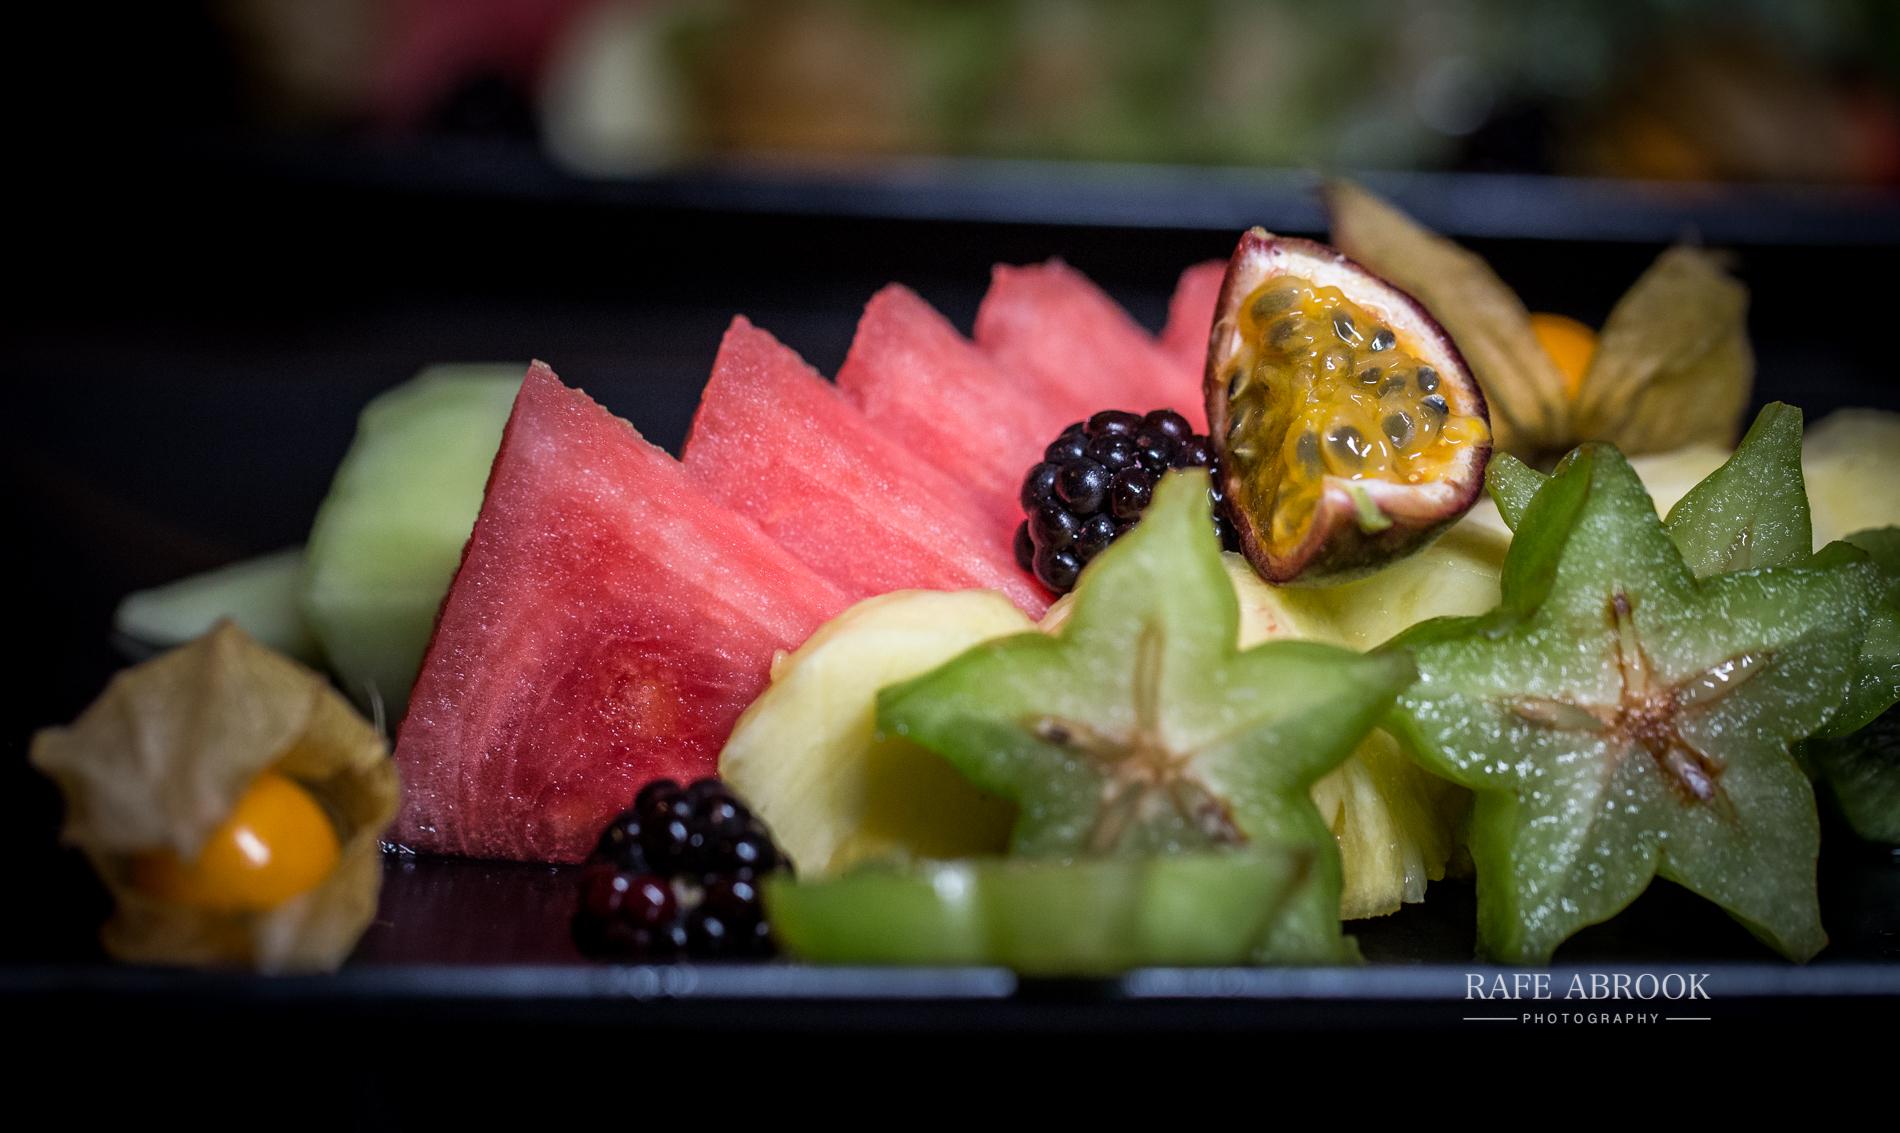 min jiang food blogger rafe abrook photography training-1012.jpg